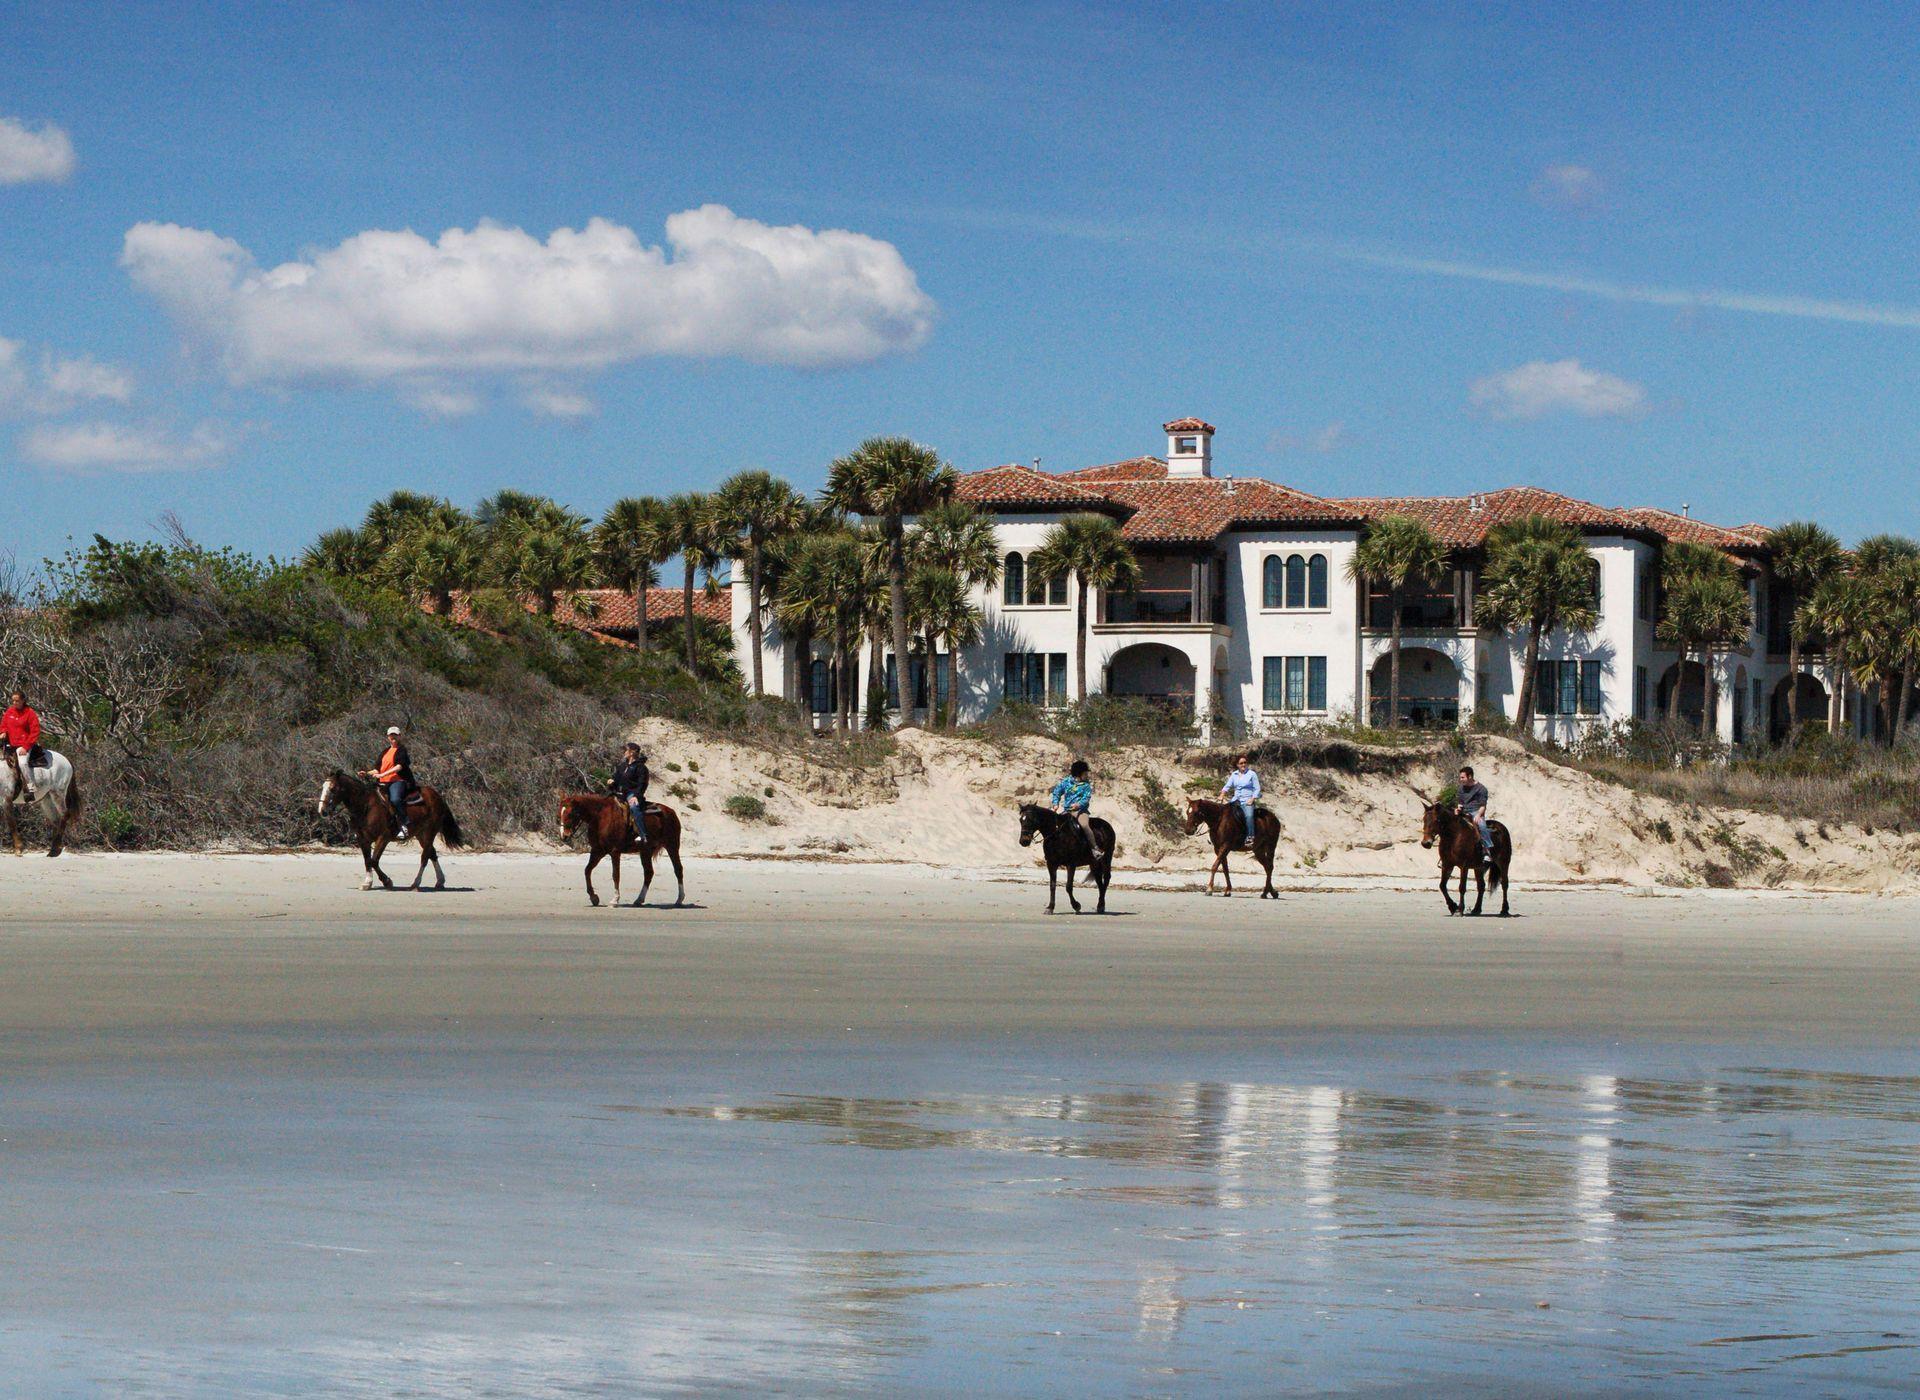 The Cloister At Sea Island Georgia Islands Luxury Travel Trip Ideas Sky Beach Water Coast Boardwalk S Sandy